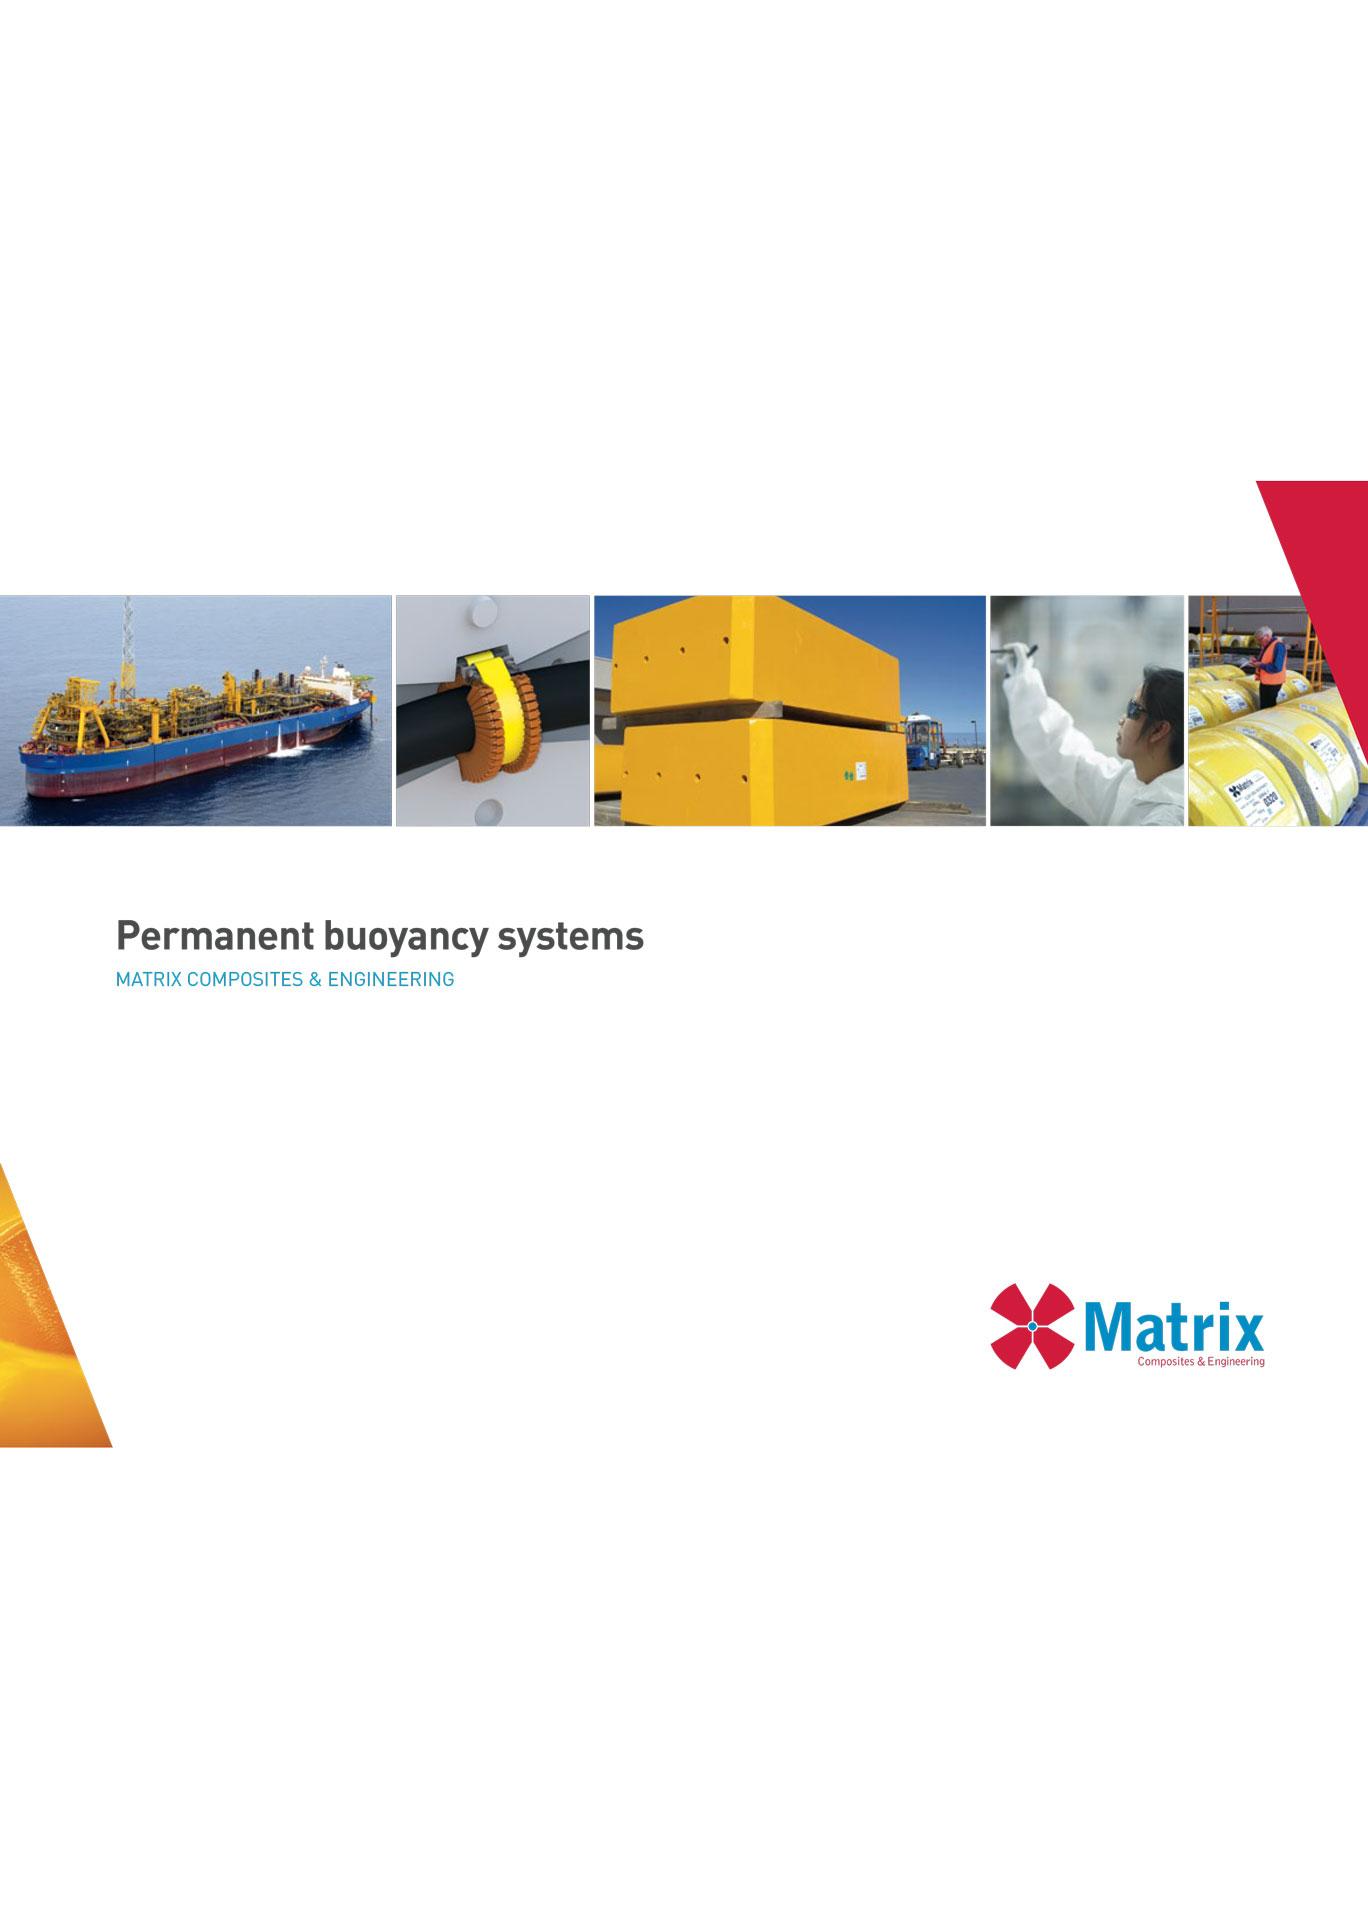 Permanent Buoyancy Solutions